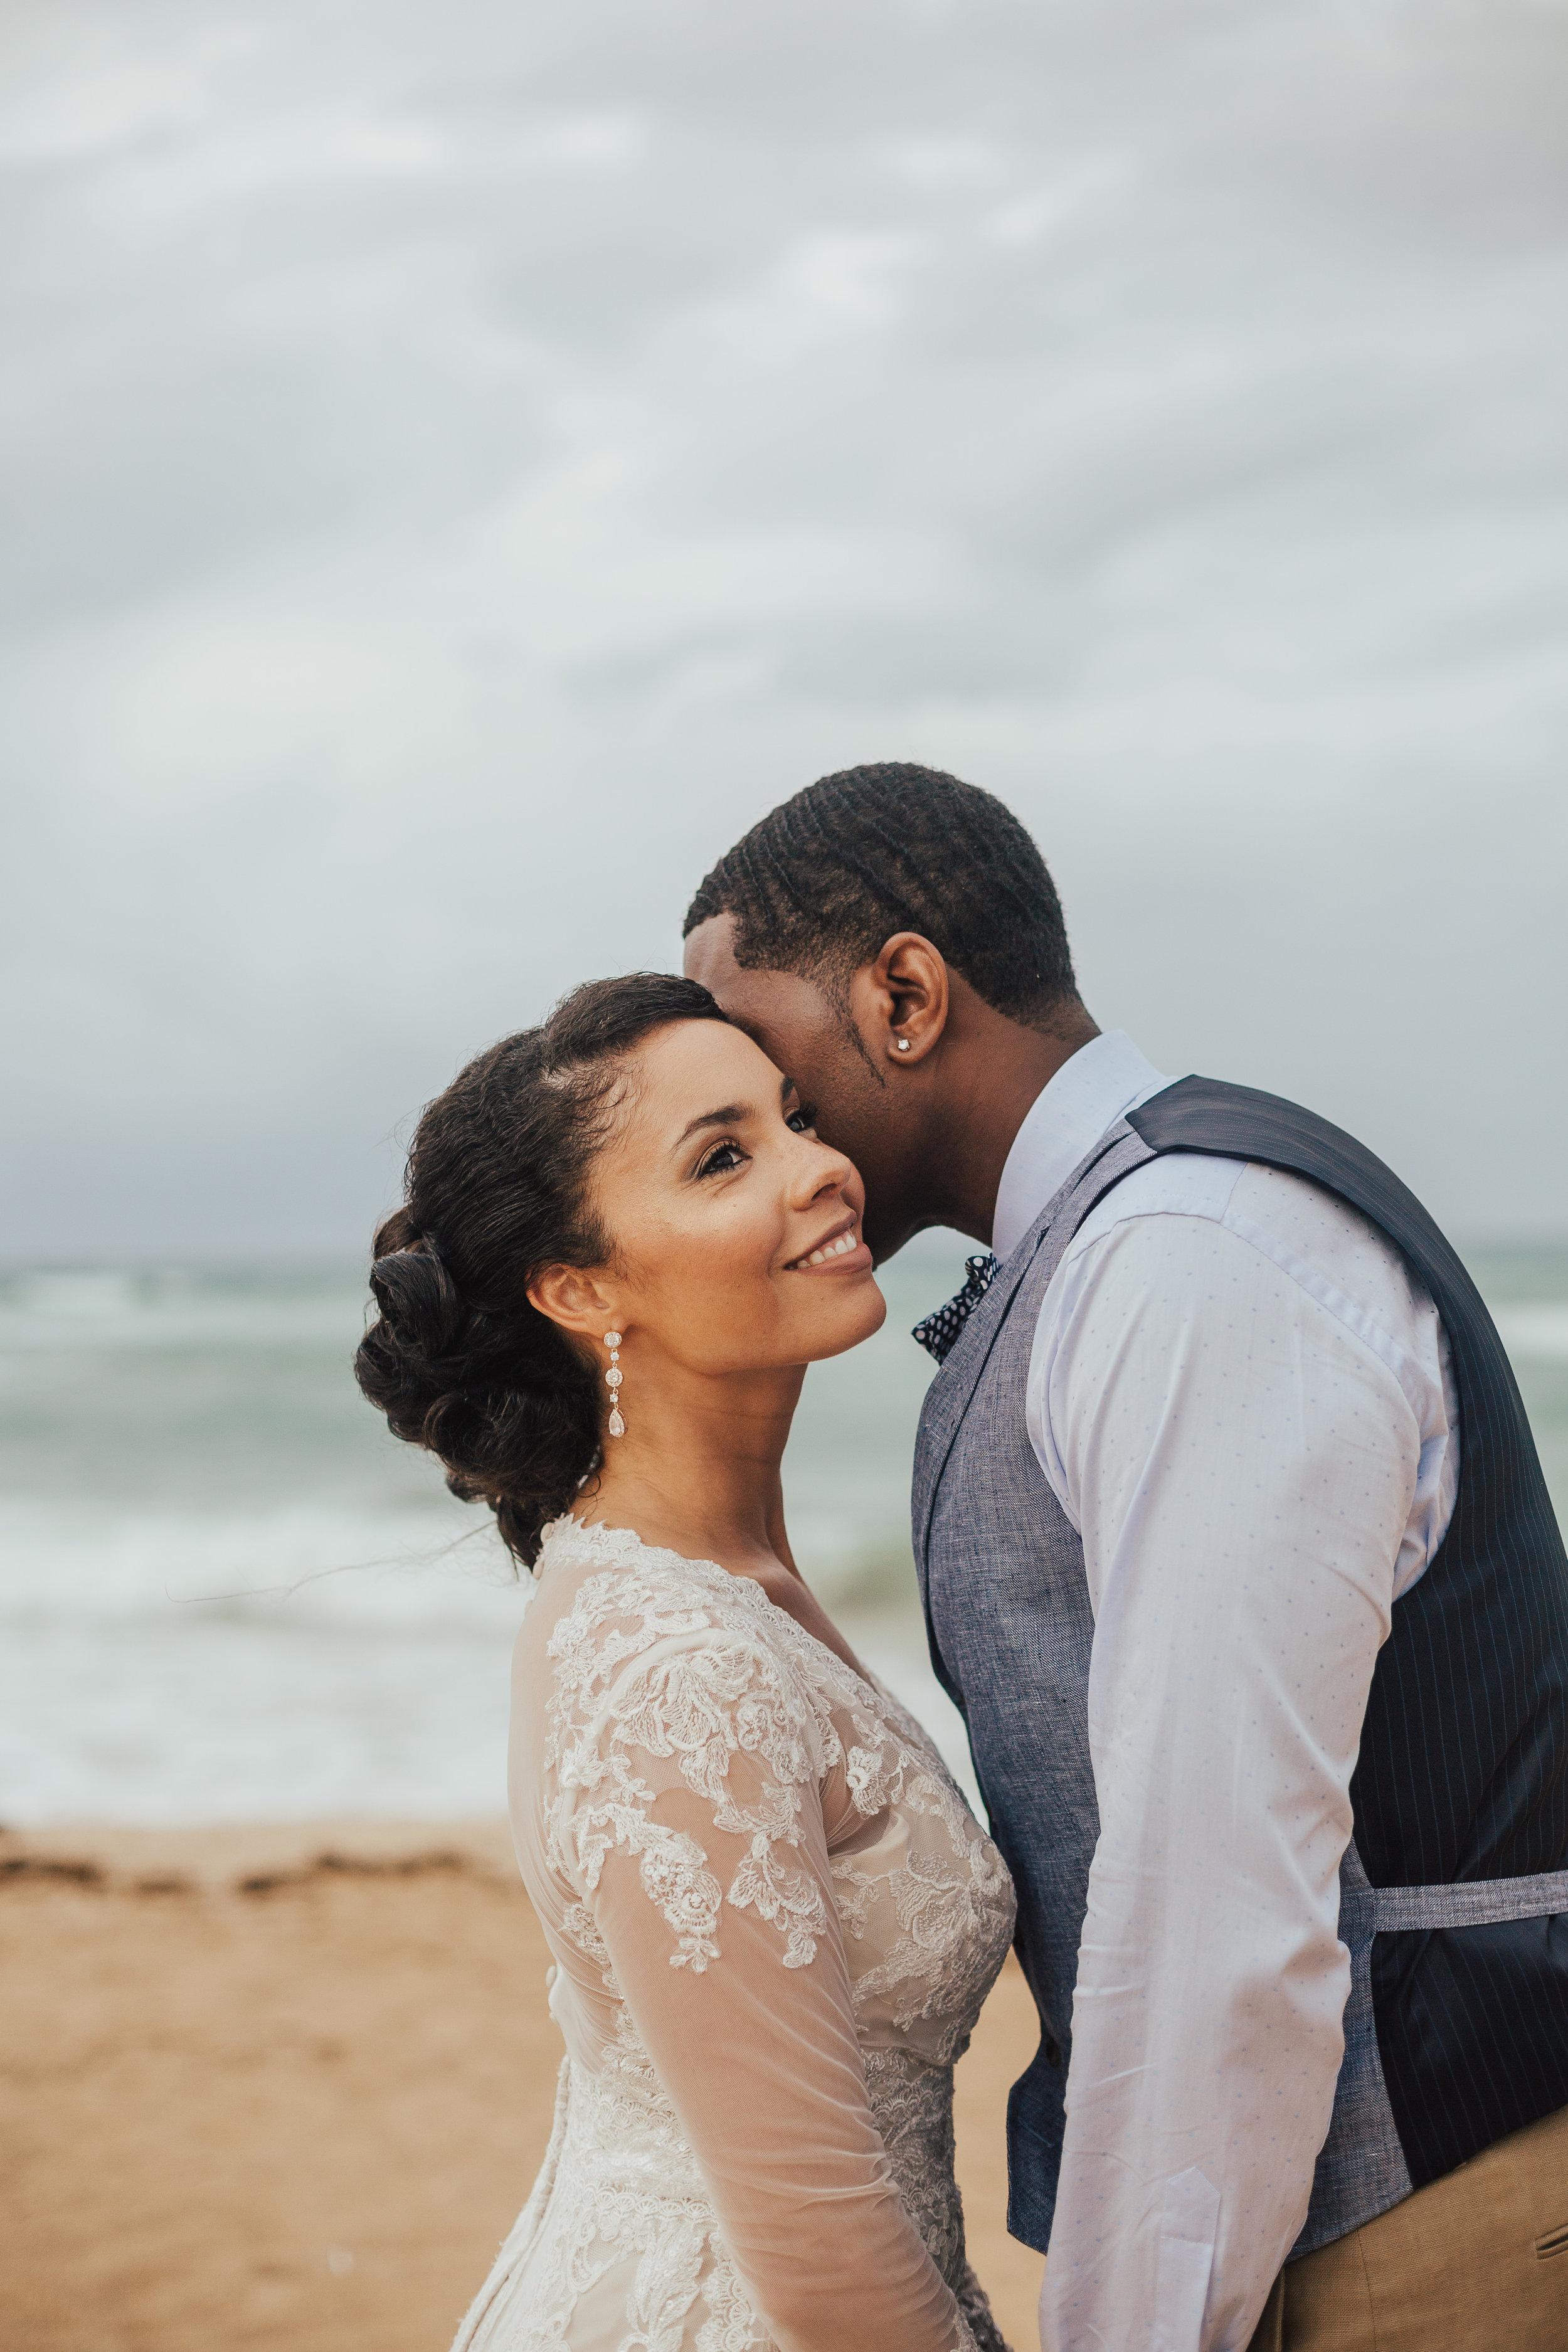 Destination-Wedding-Photographer-elope-cleveland-wedding-photographer-elopement-photographer-beach-tulum-wedding-mexico-elopement